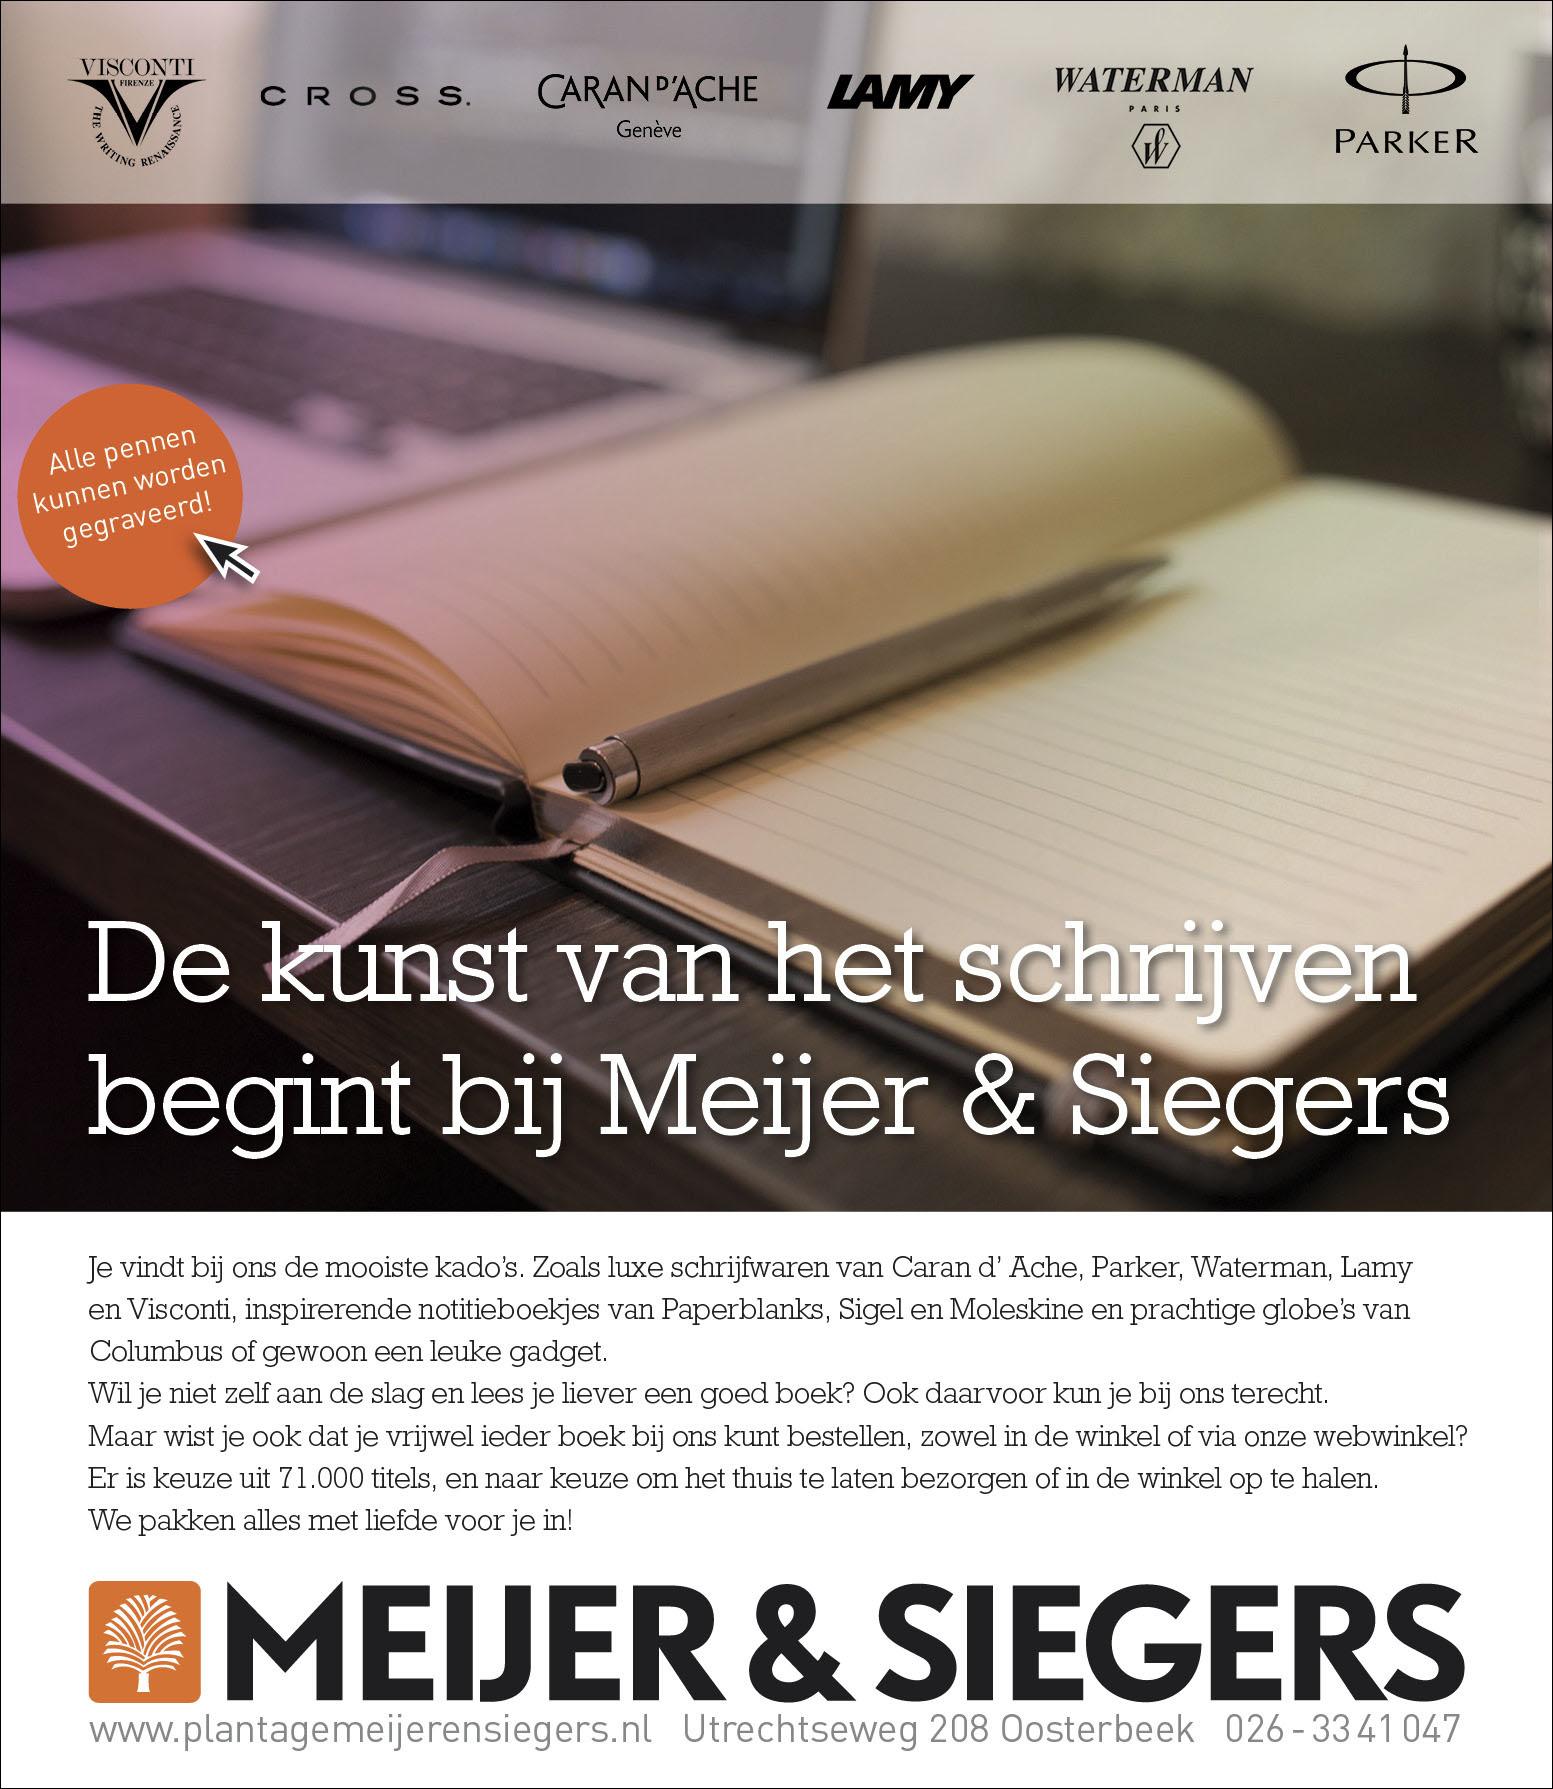 tomworks-meijer-en-siegers-advertentie-airborne